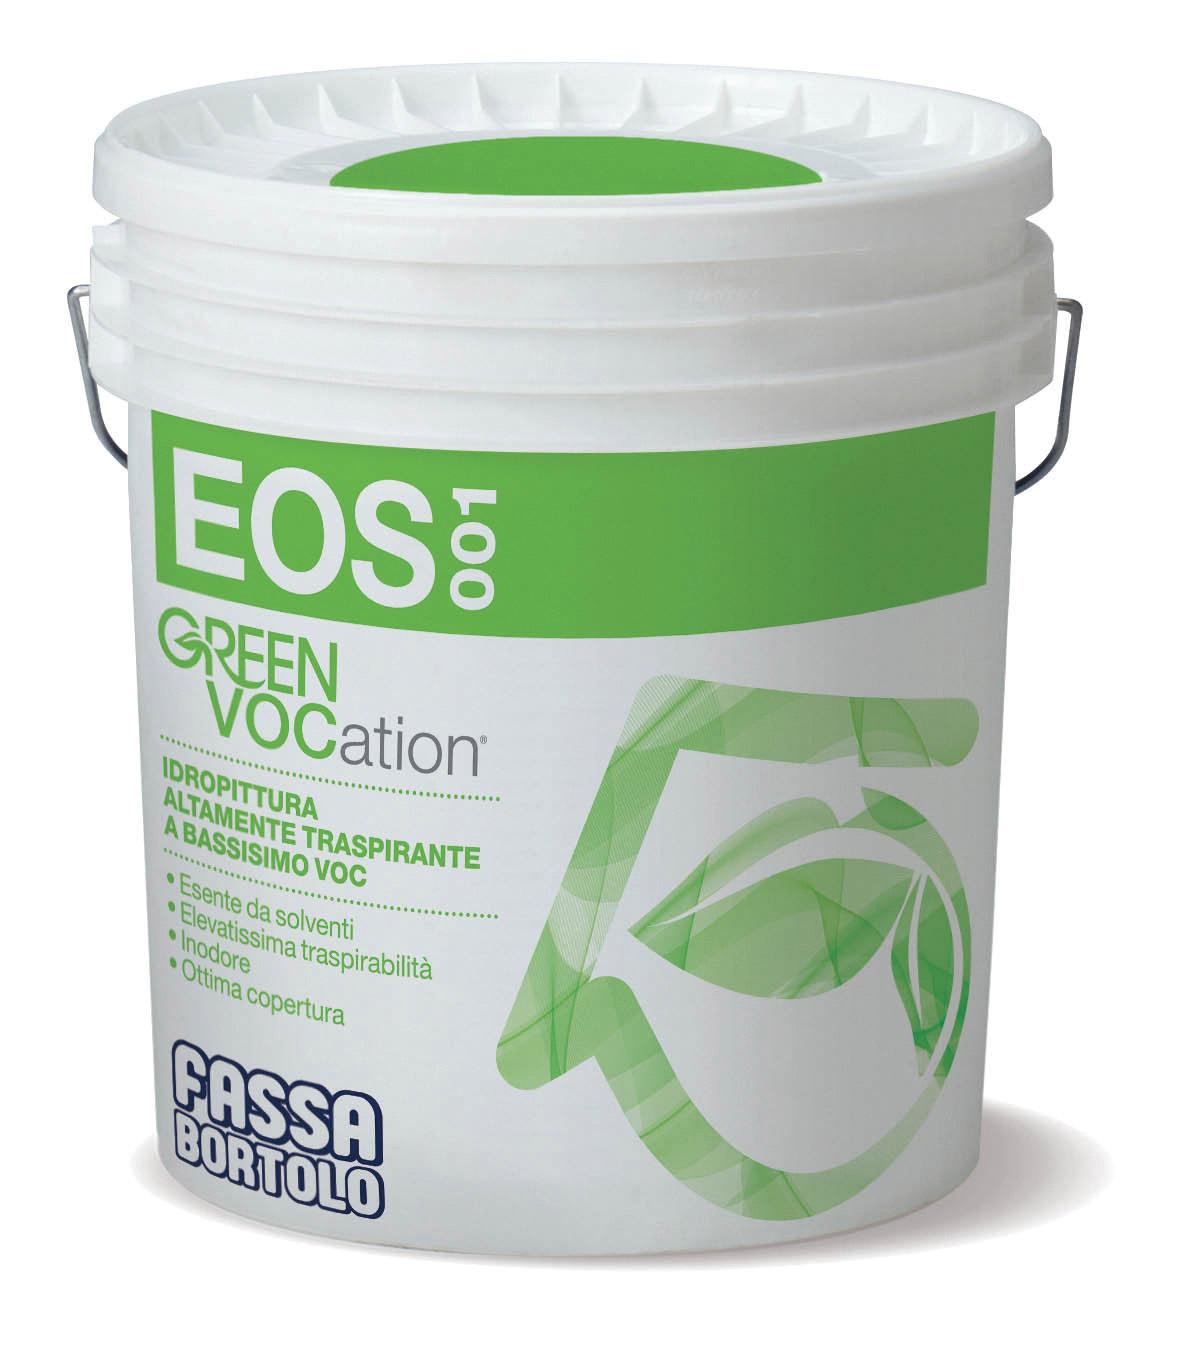 EOS 001: Tinta aquosa altamente transpirante para interior com baixíssimos COV